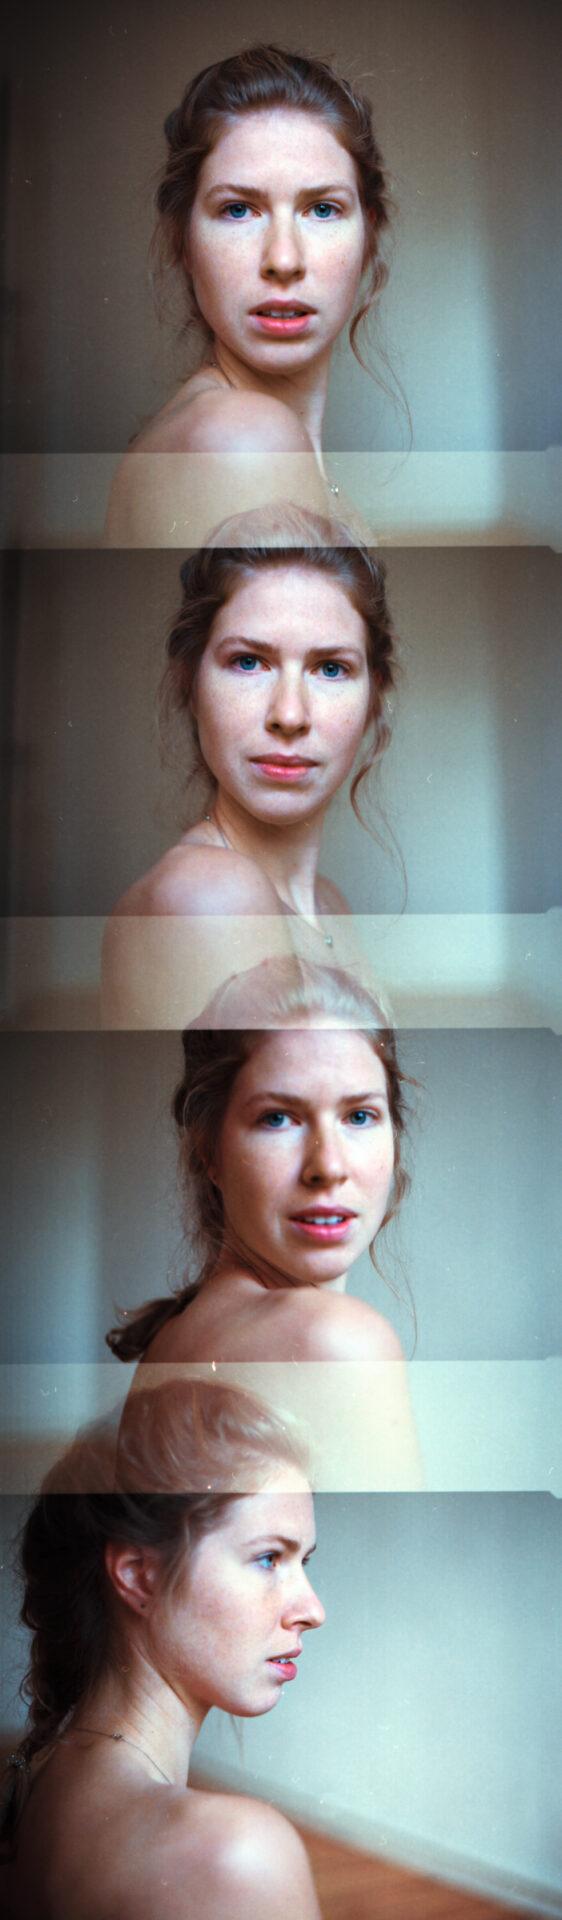 Chiara, Analog, Portrait, Film, 11